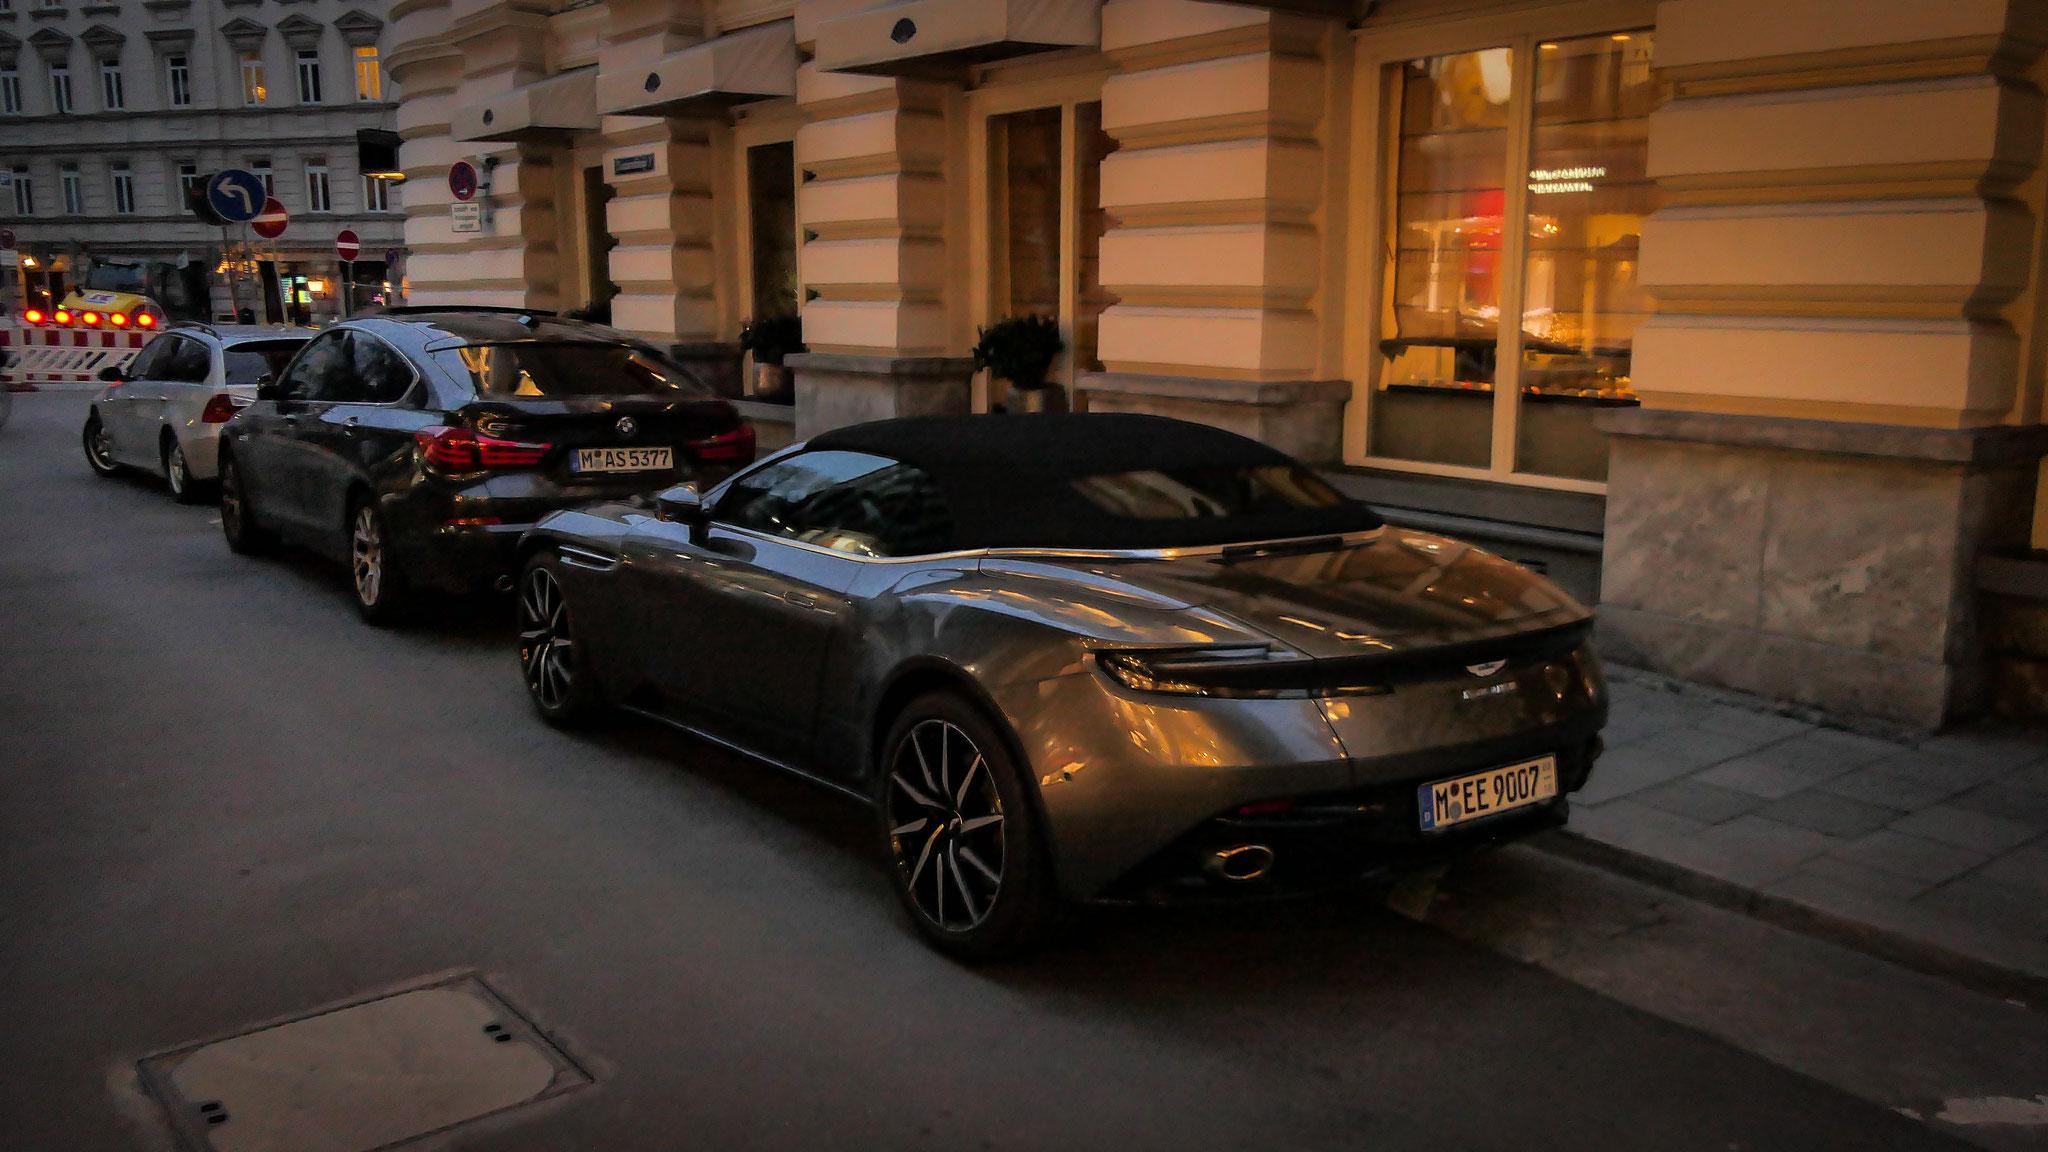 Aston Martin DB11 Volante - M-EE-9007